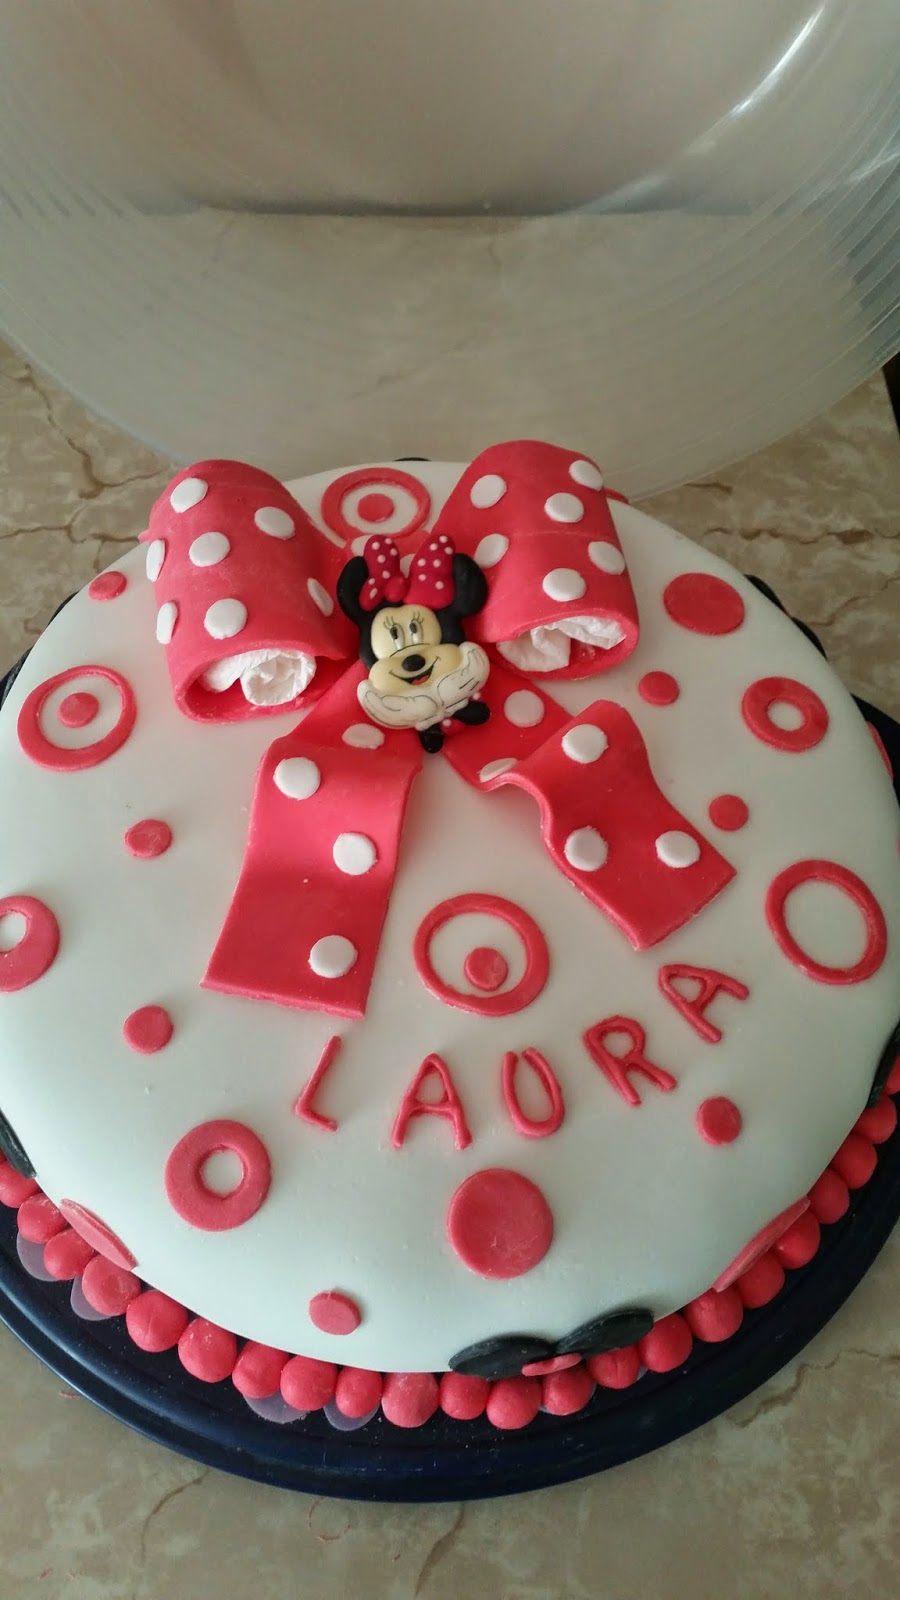 minnie torta képek Diával főzni jó!: Minnie torta minnie torta képek